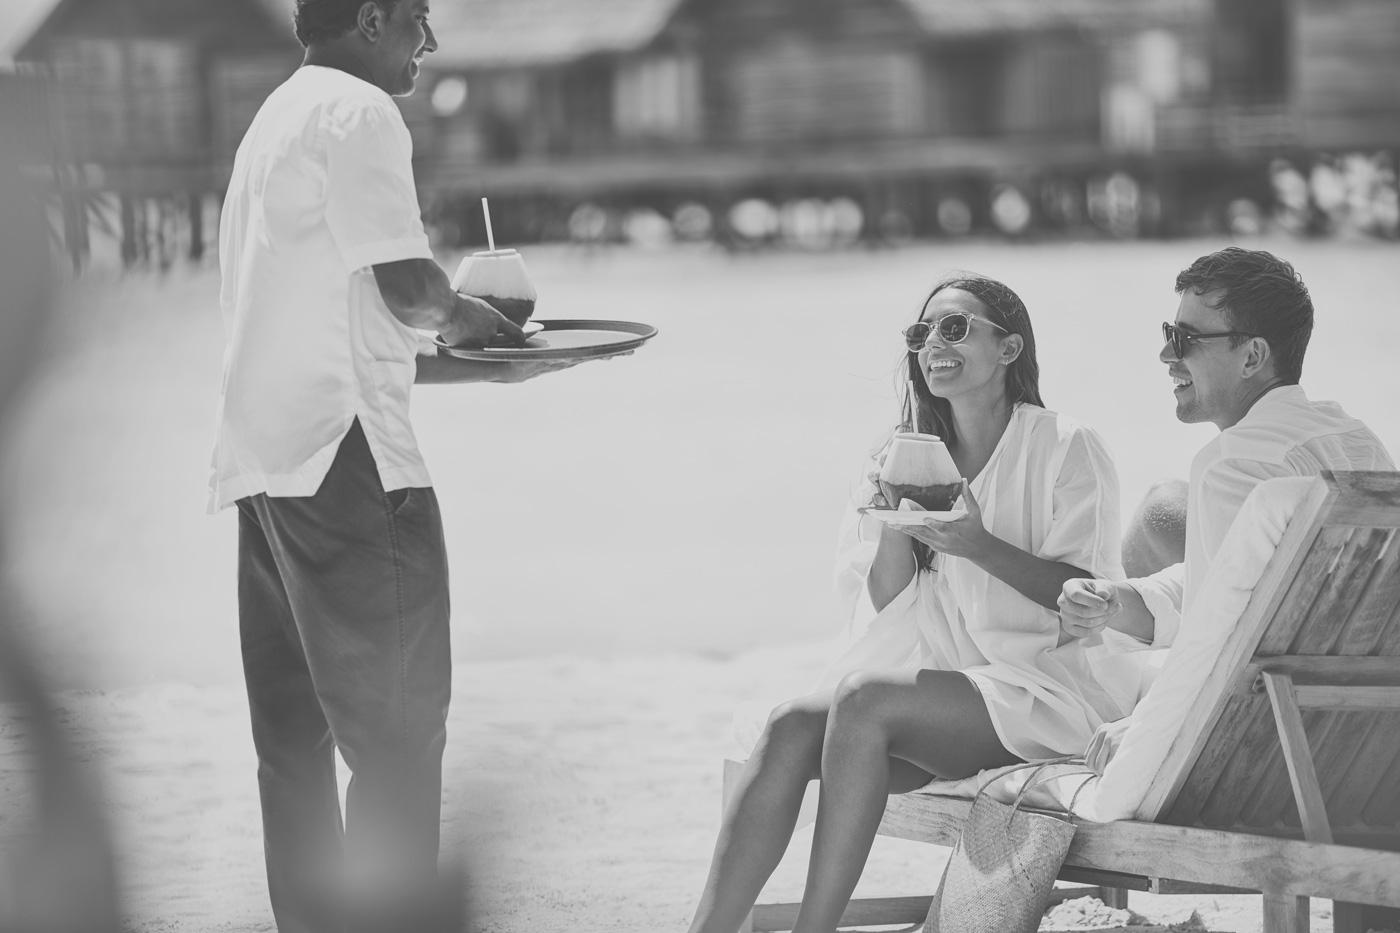 Pärchen trinkt Kokosnuss am Strand